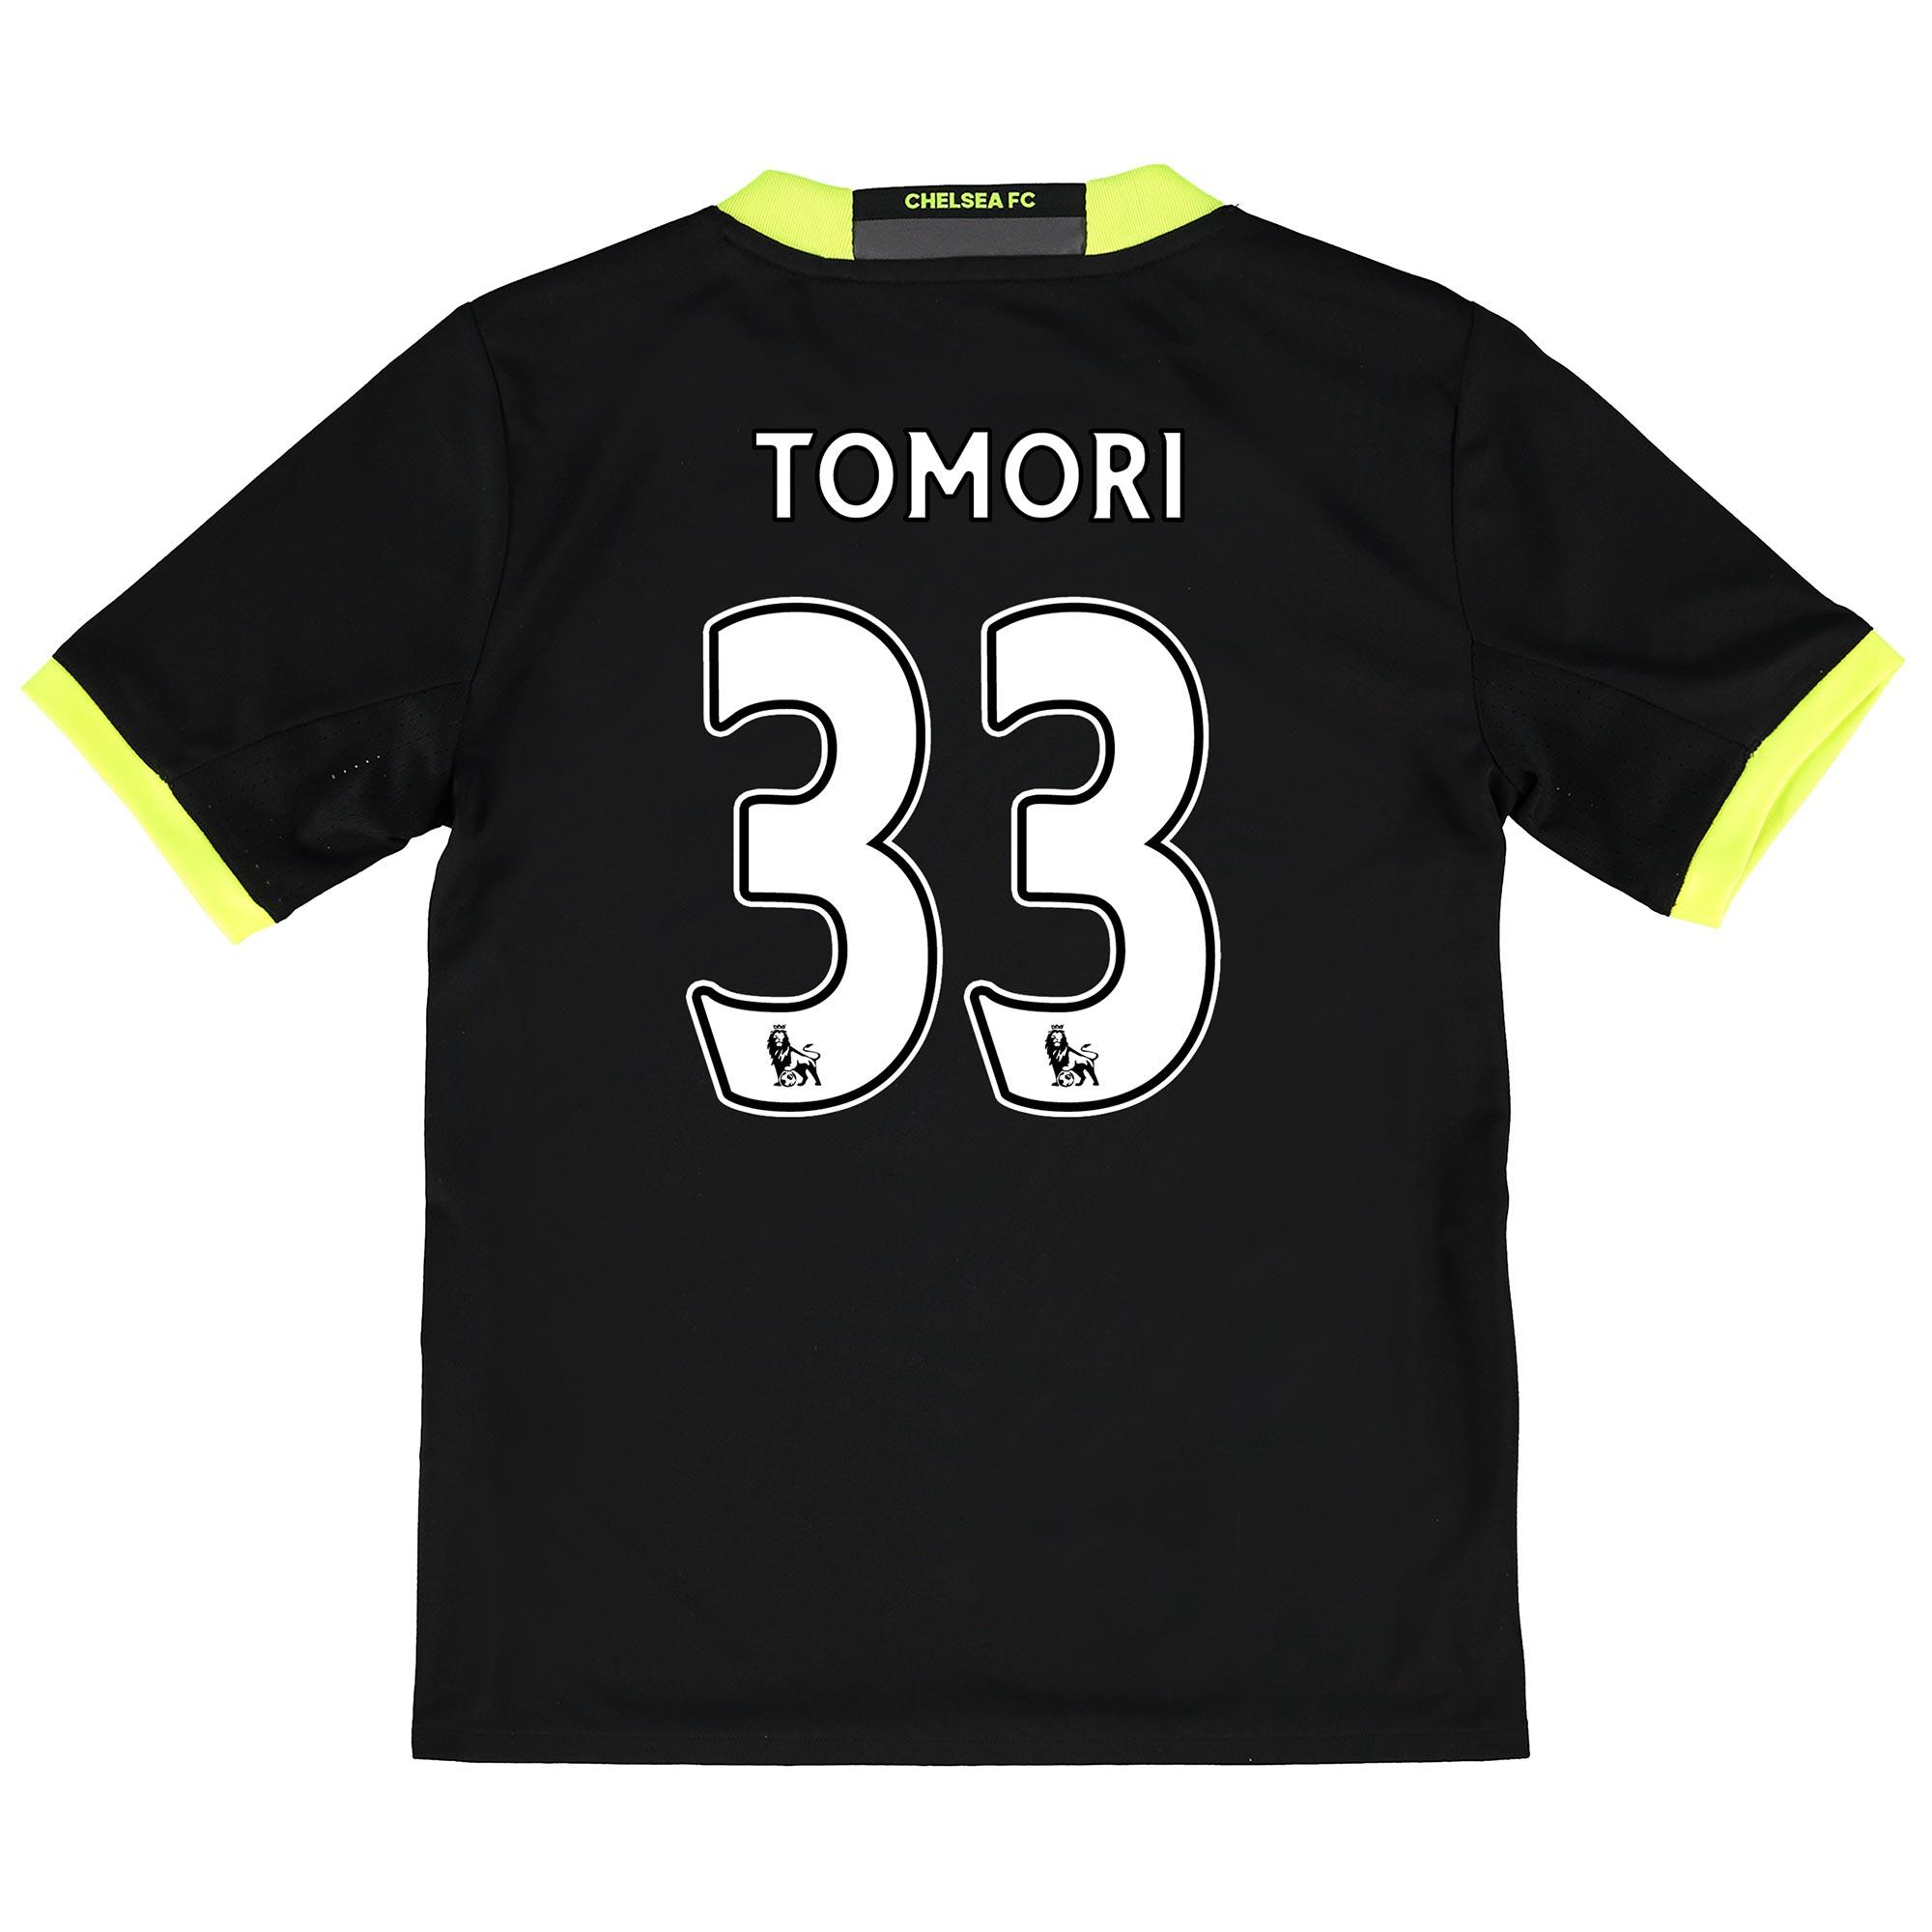 Chelsea Away Mini Kit 16-17 with Tomori 33 printing